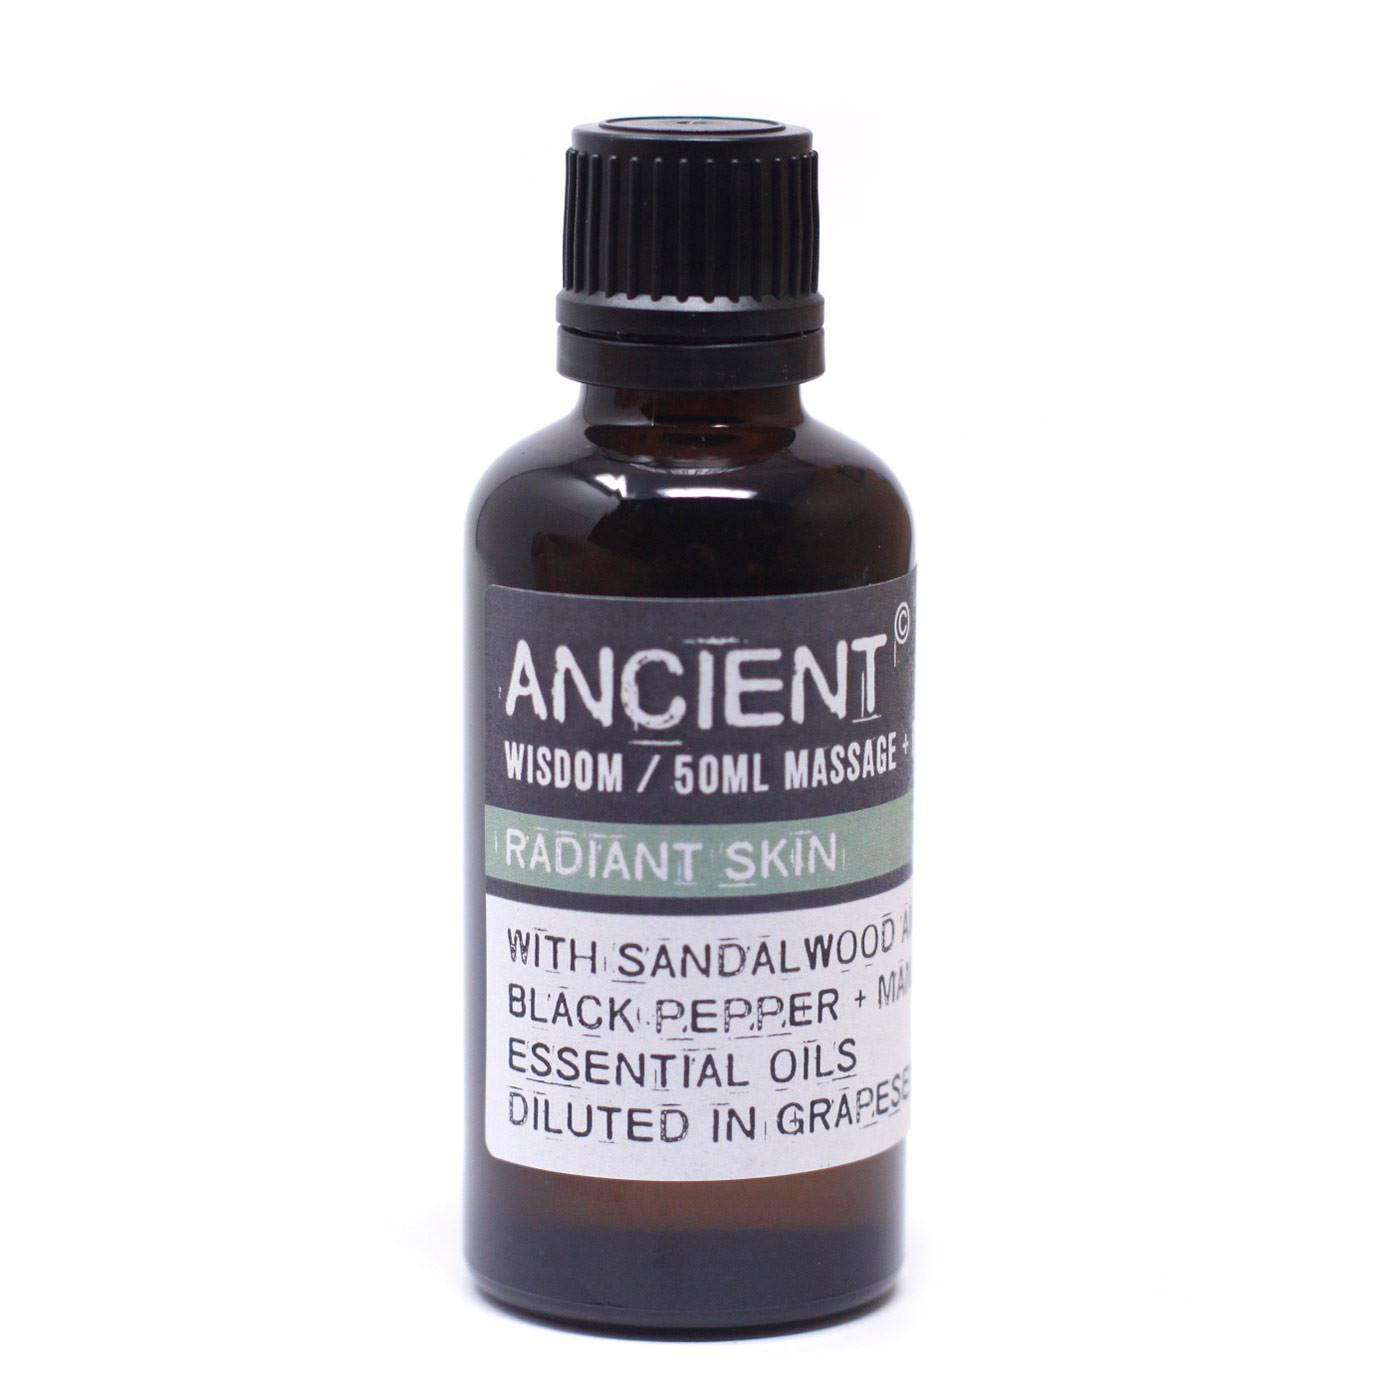 Radiant Skin Massage Oil 50ml